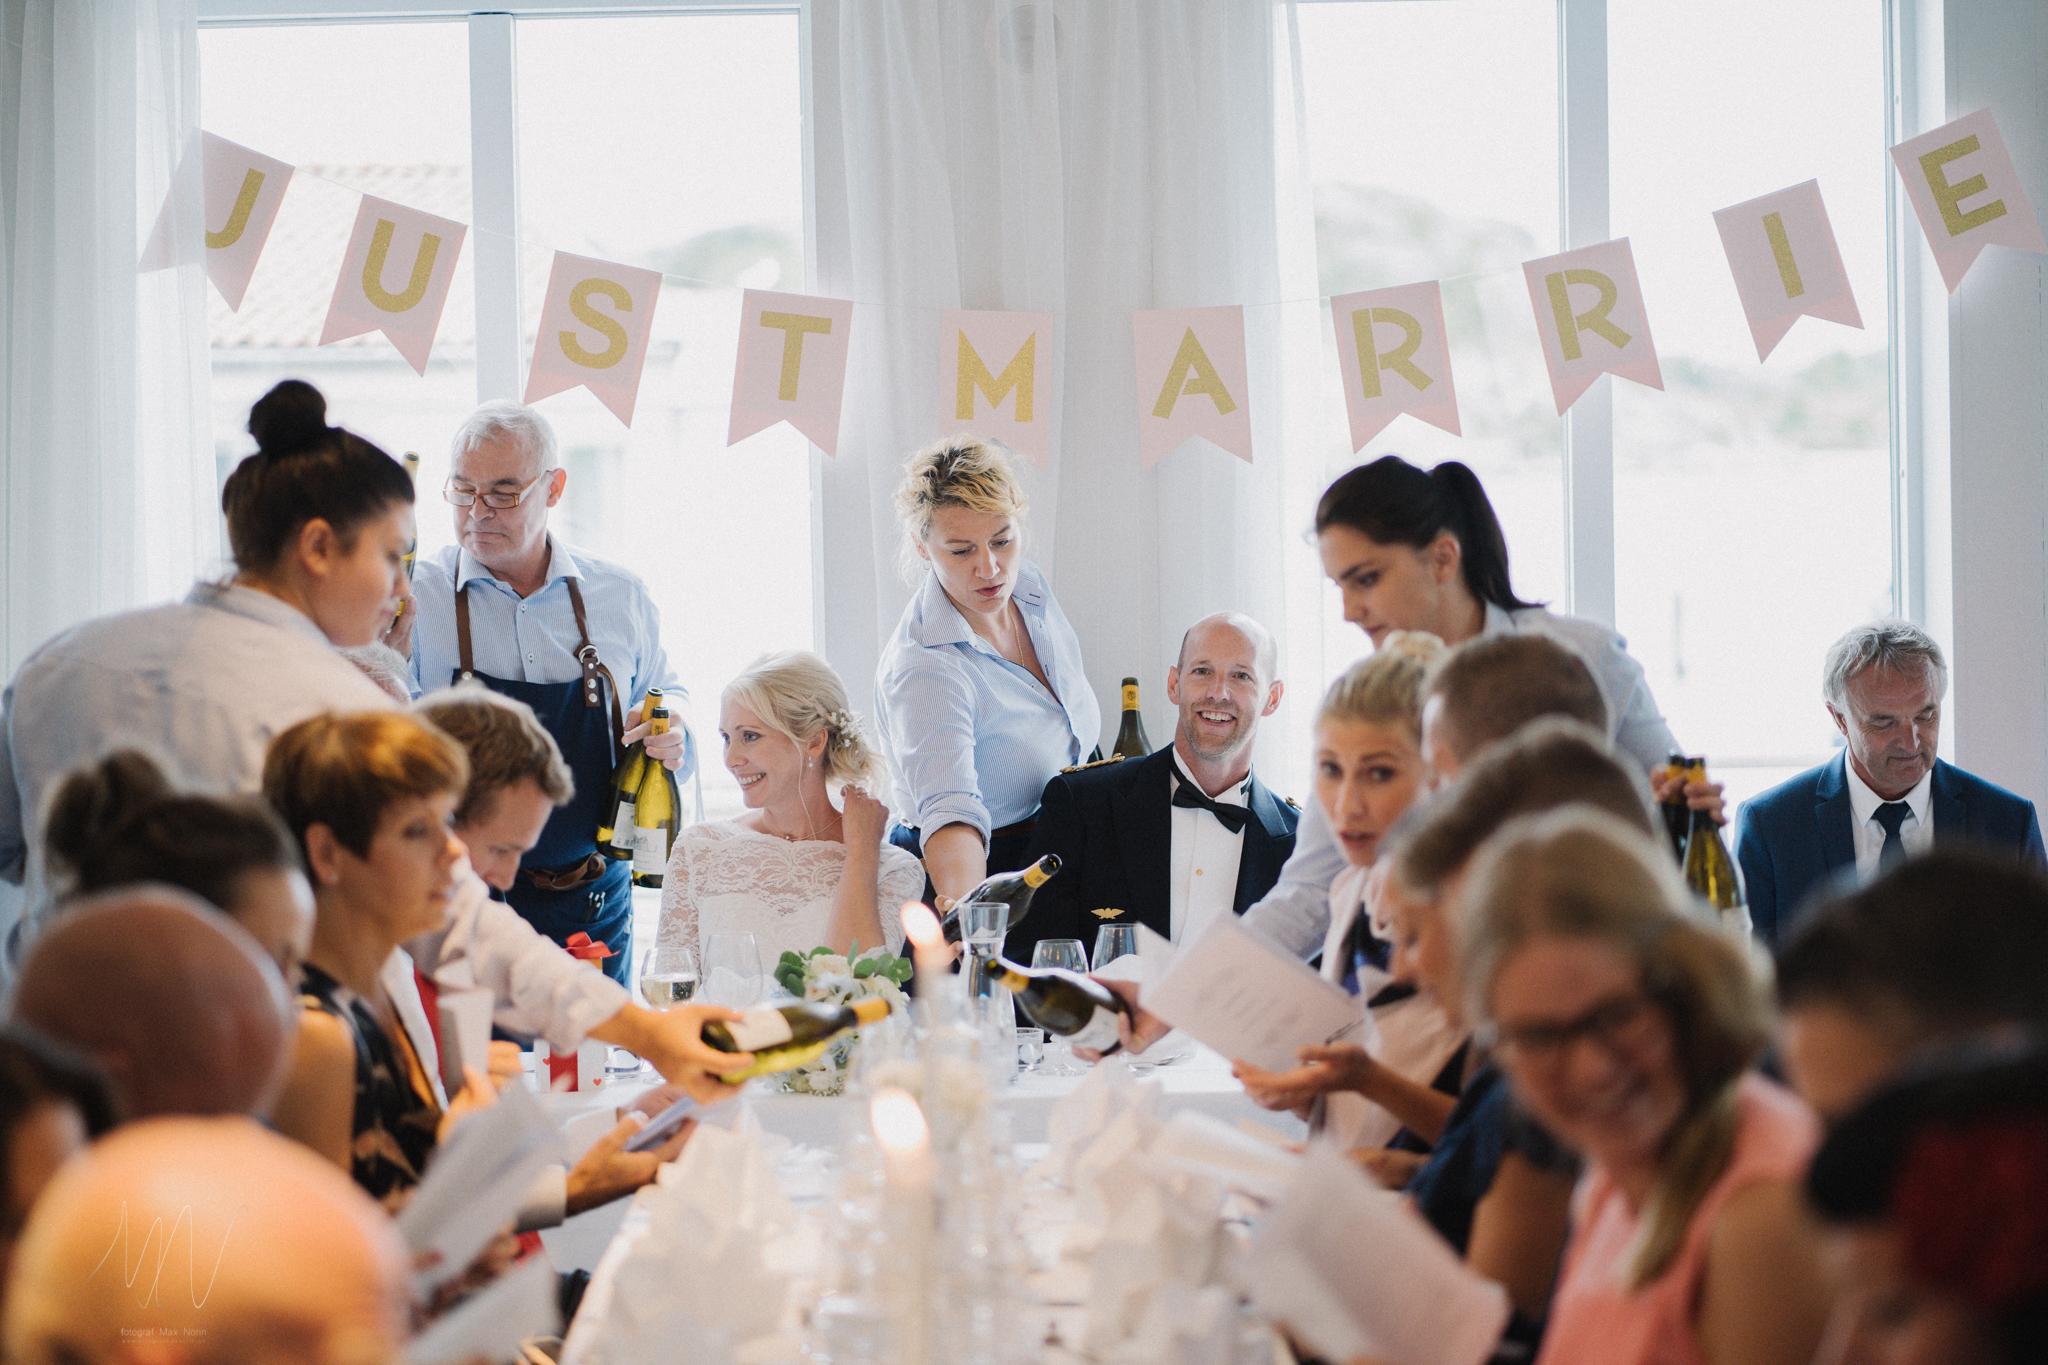 Bröllop-fotografmaxnorin.se-MariaMarcus-442.JPG